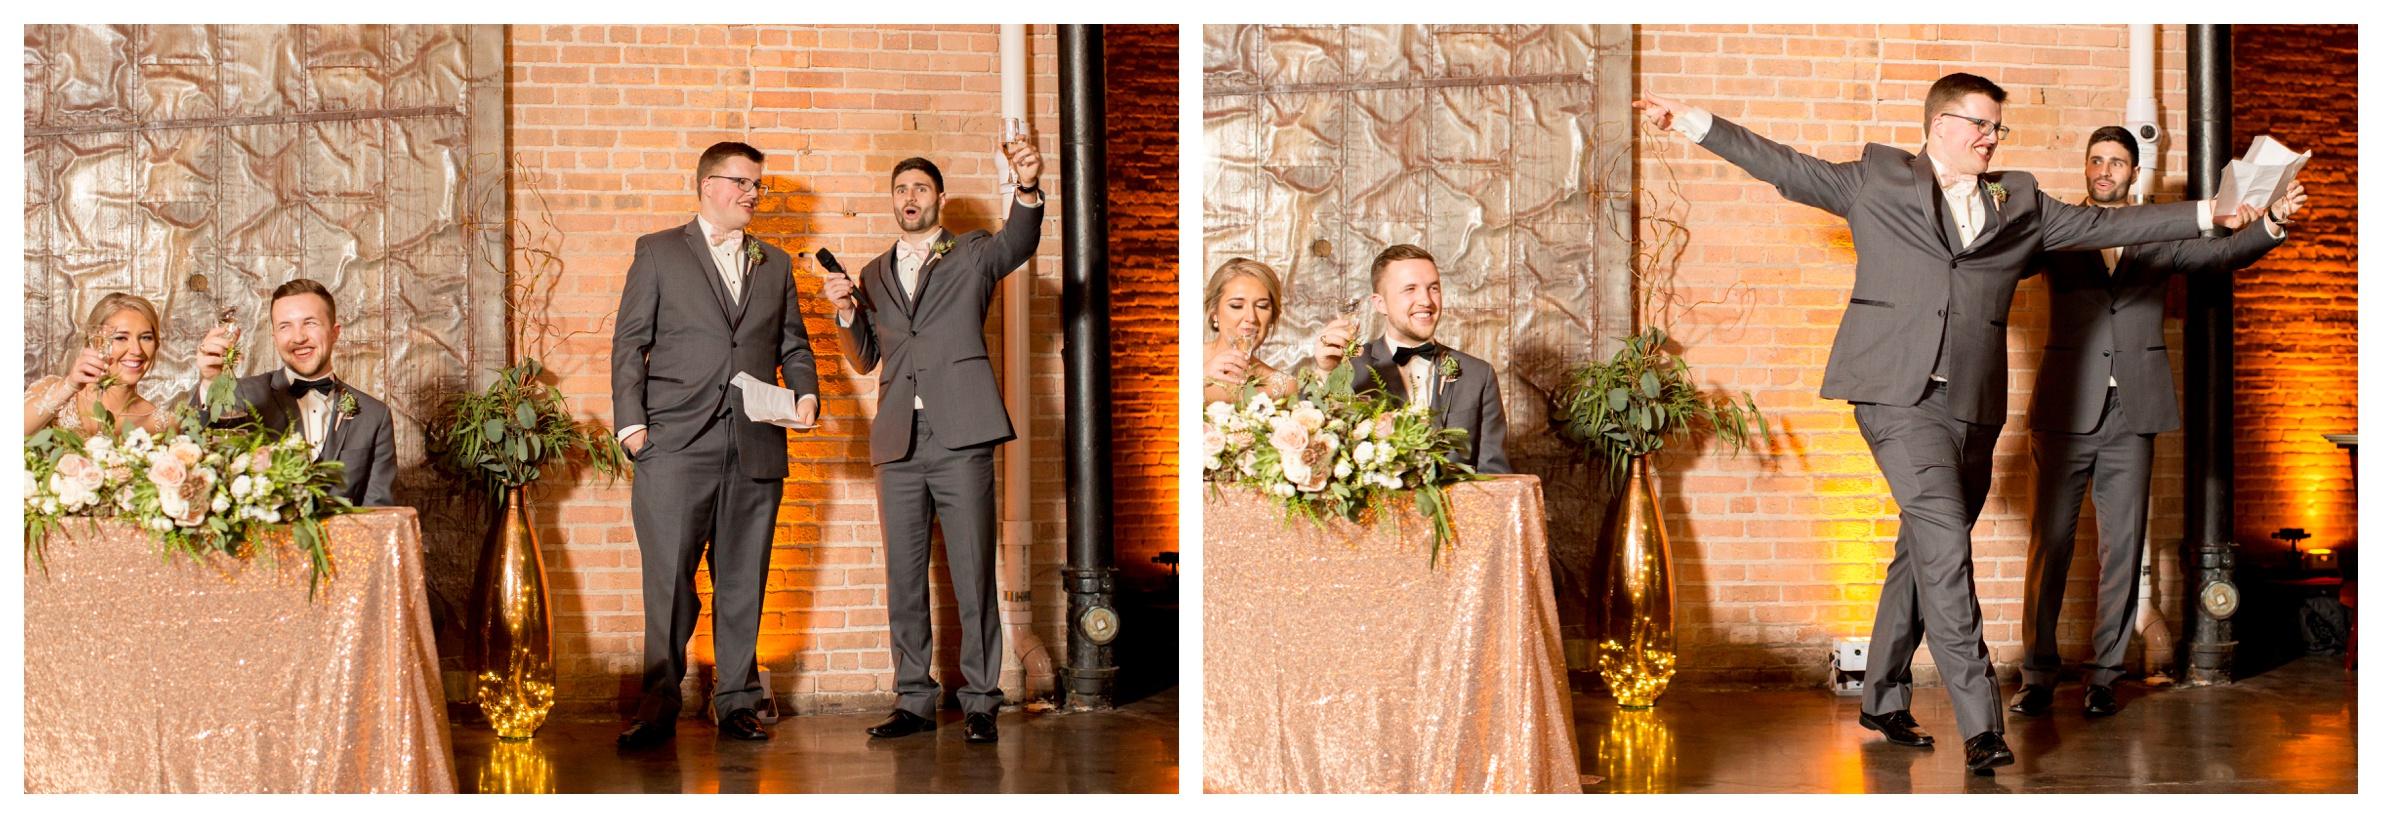 morgan-manufacturing-wedding-photography